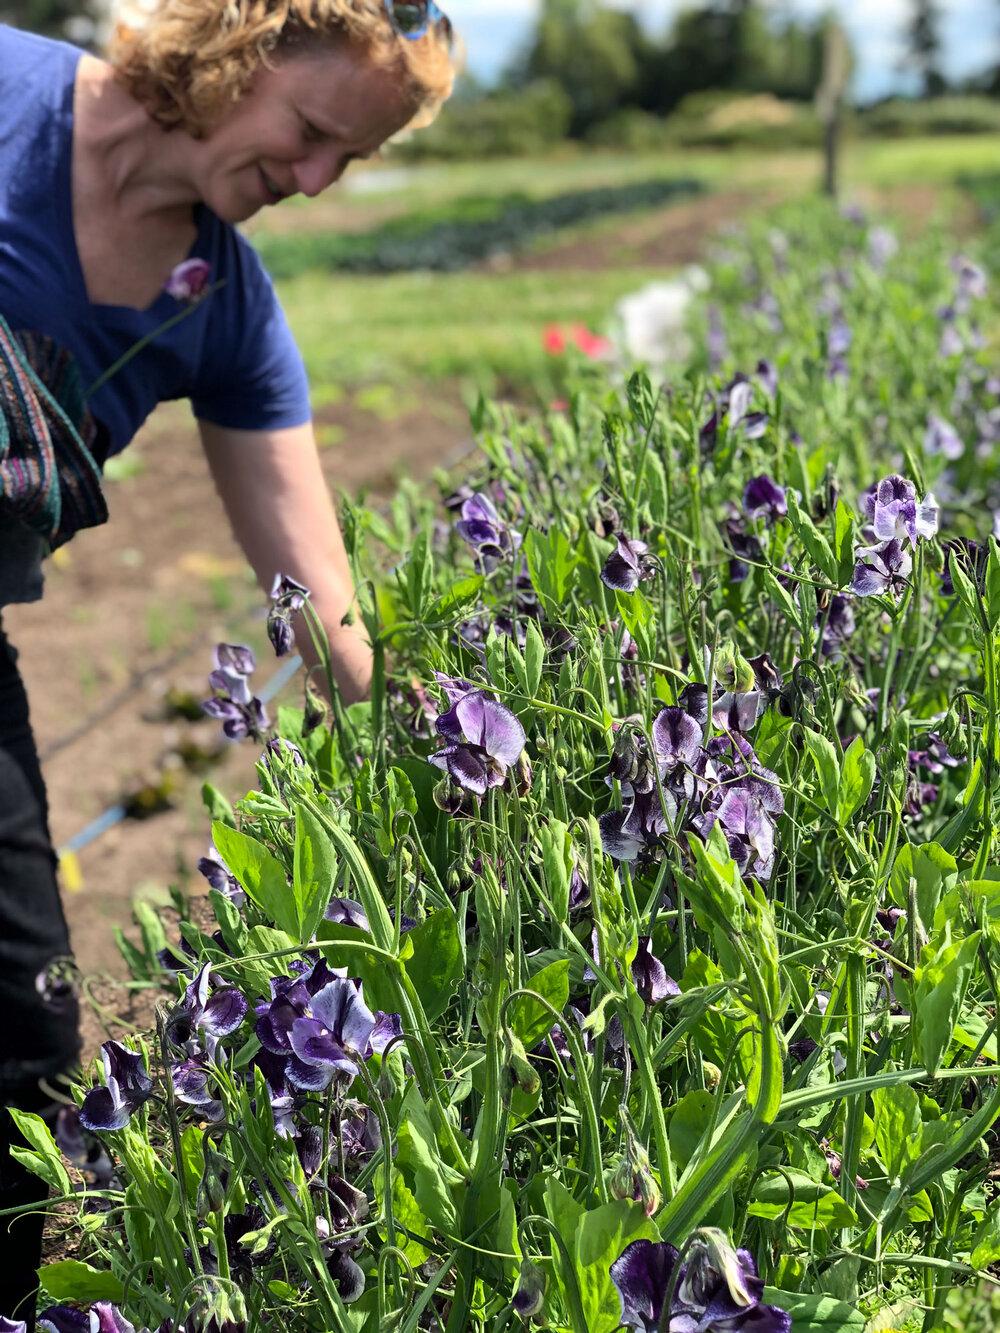 Liane picking bicolor purple and lavender 'Nimbus' sweet peas